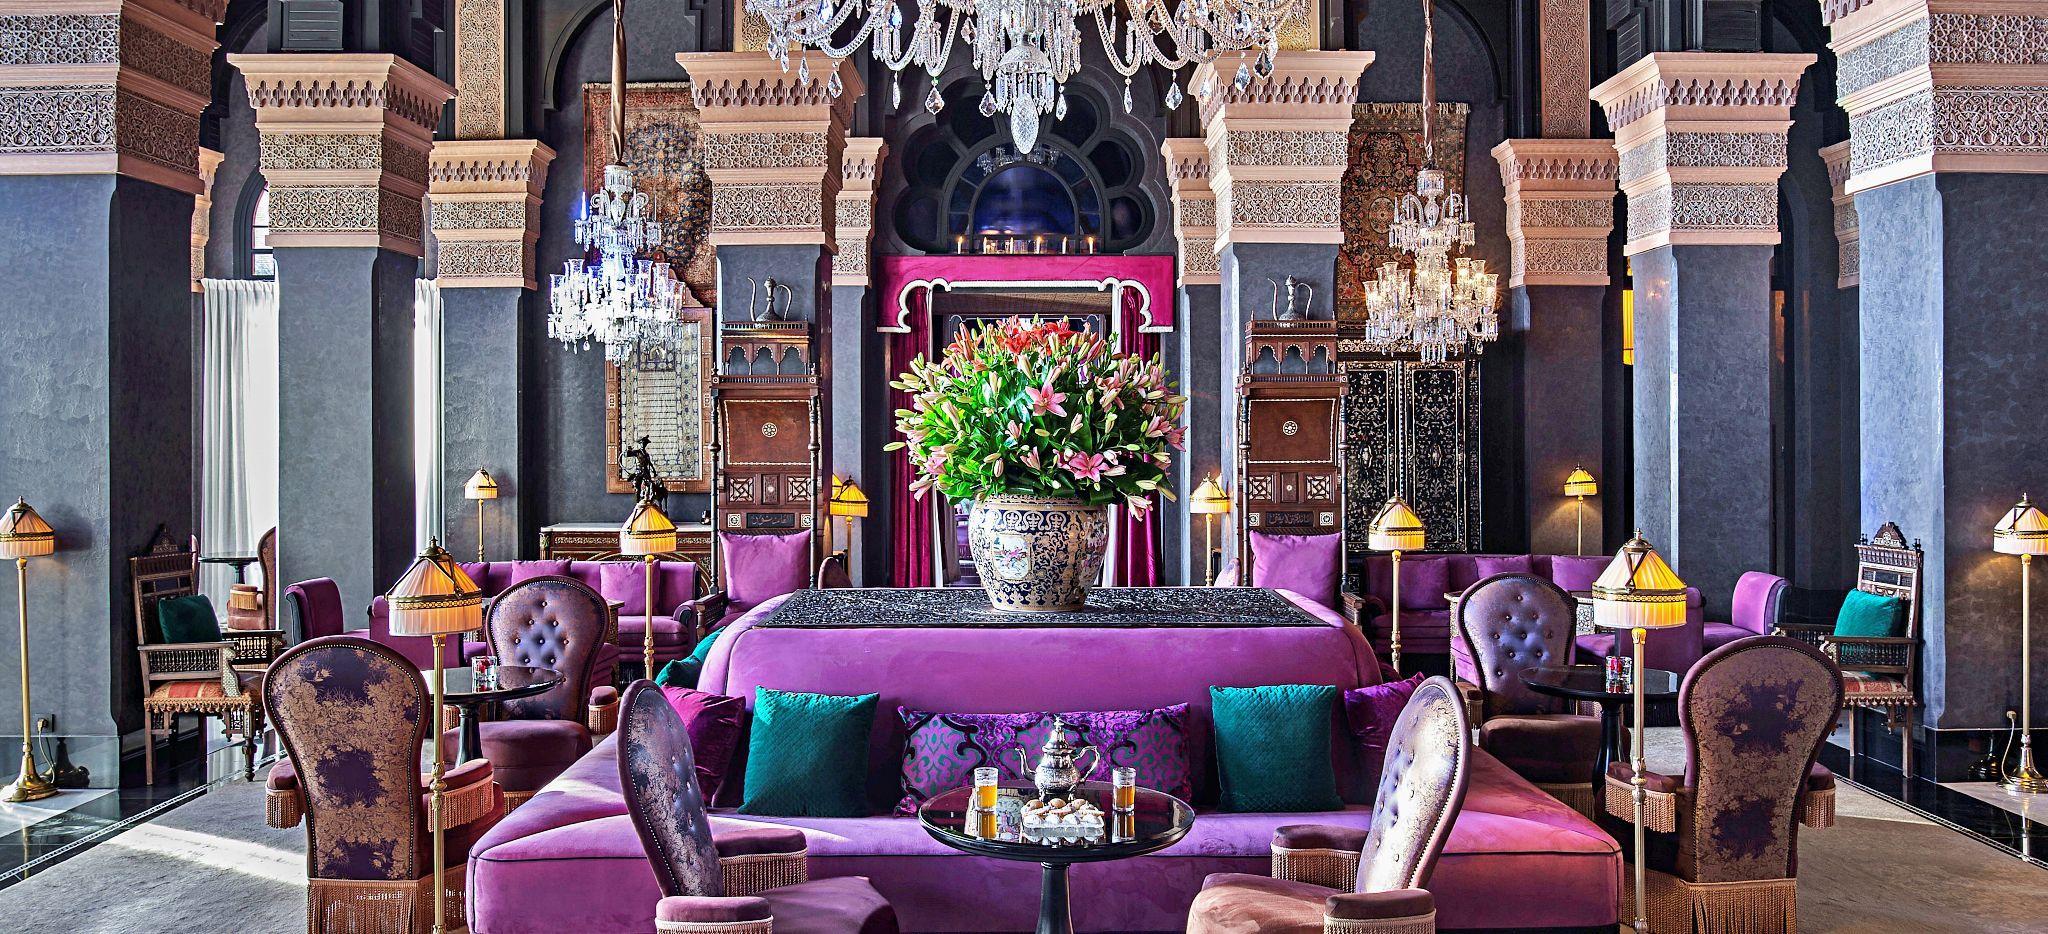 Lilane Lobby des Hotels Selman